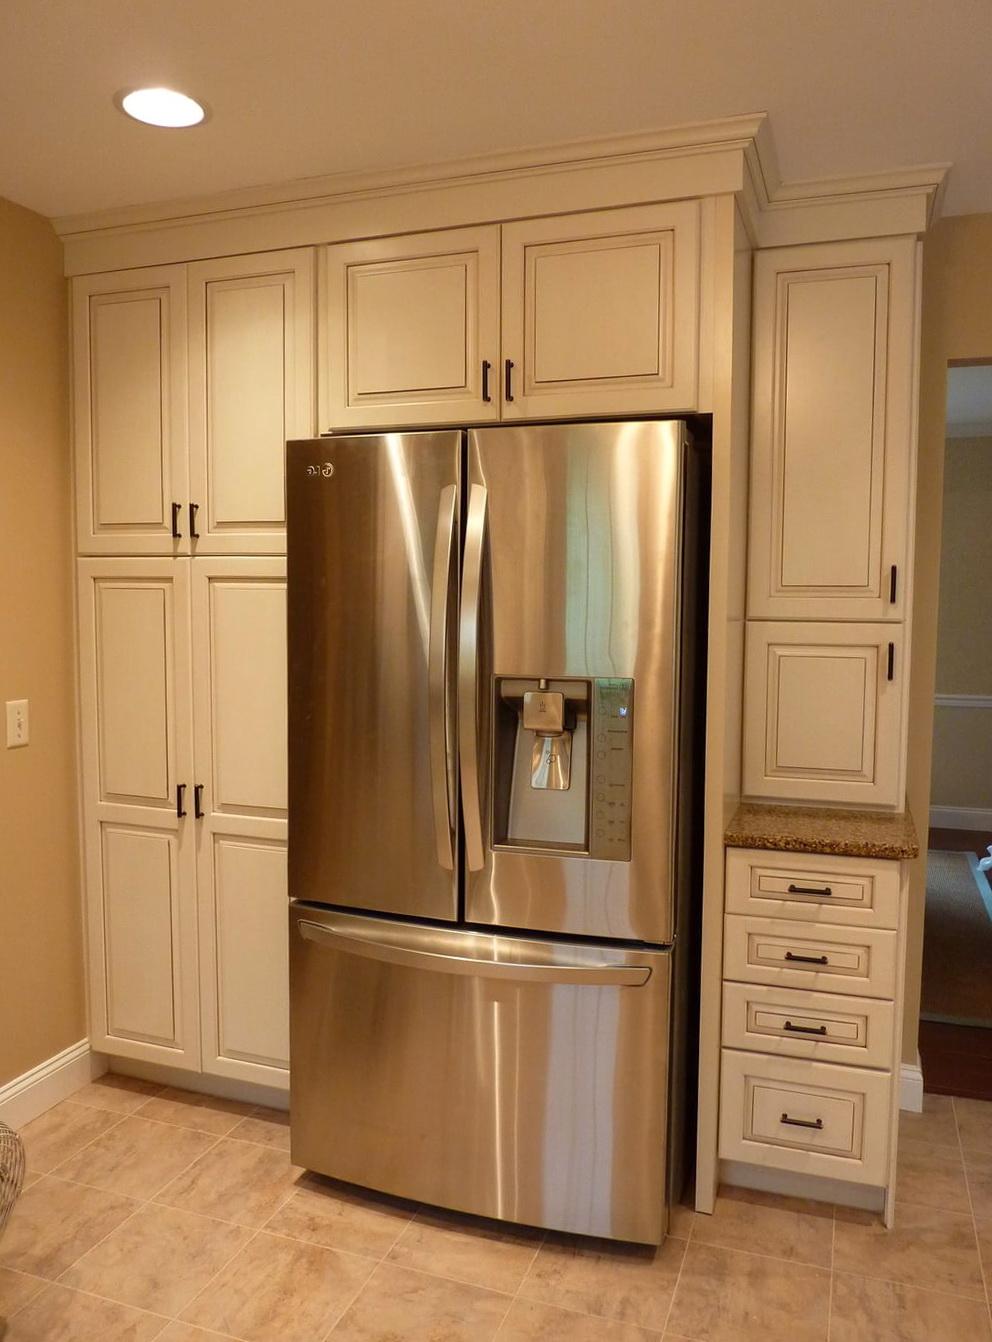 Kraftmaid Kitchen Cabinets Cost